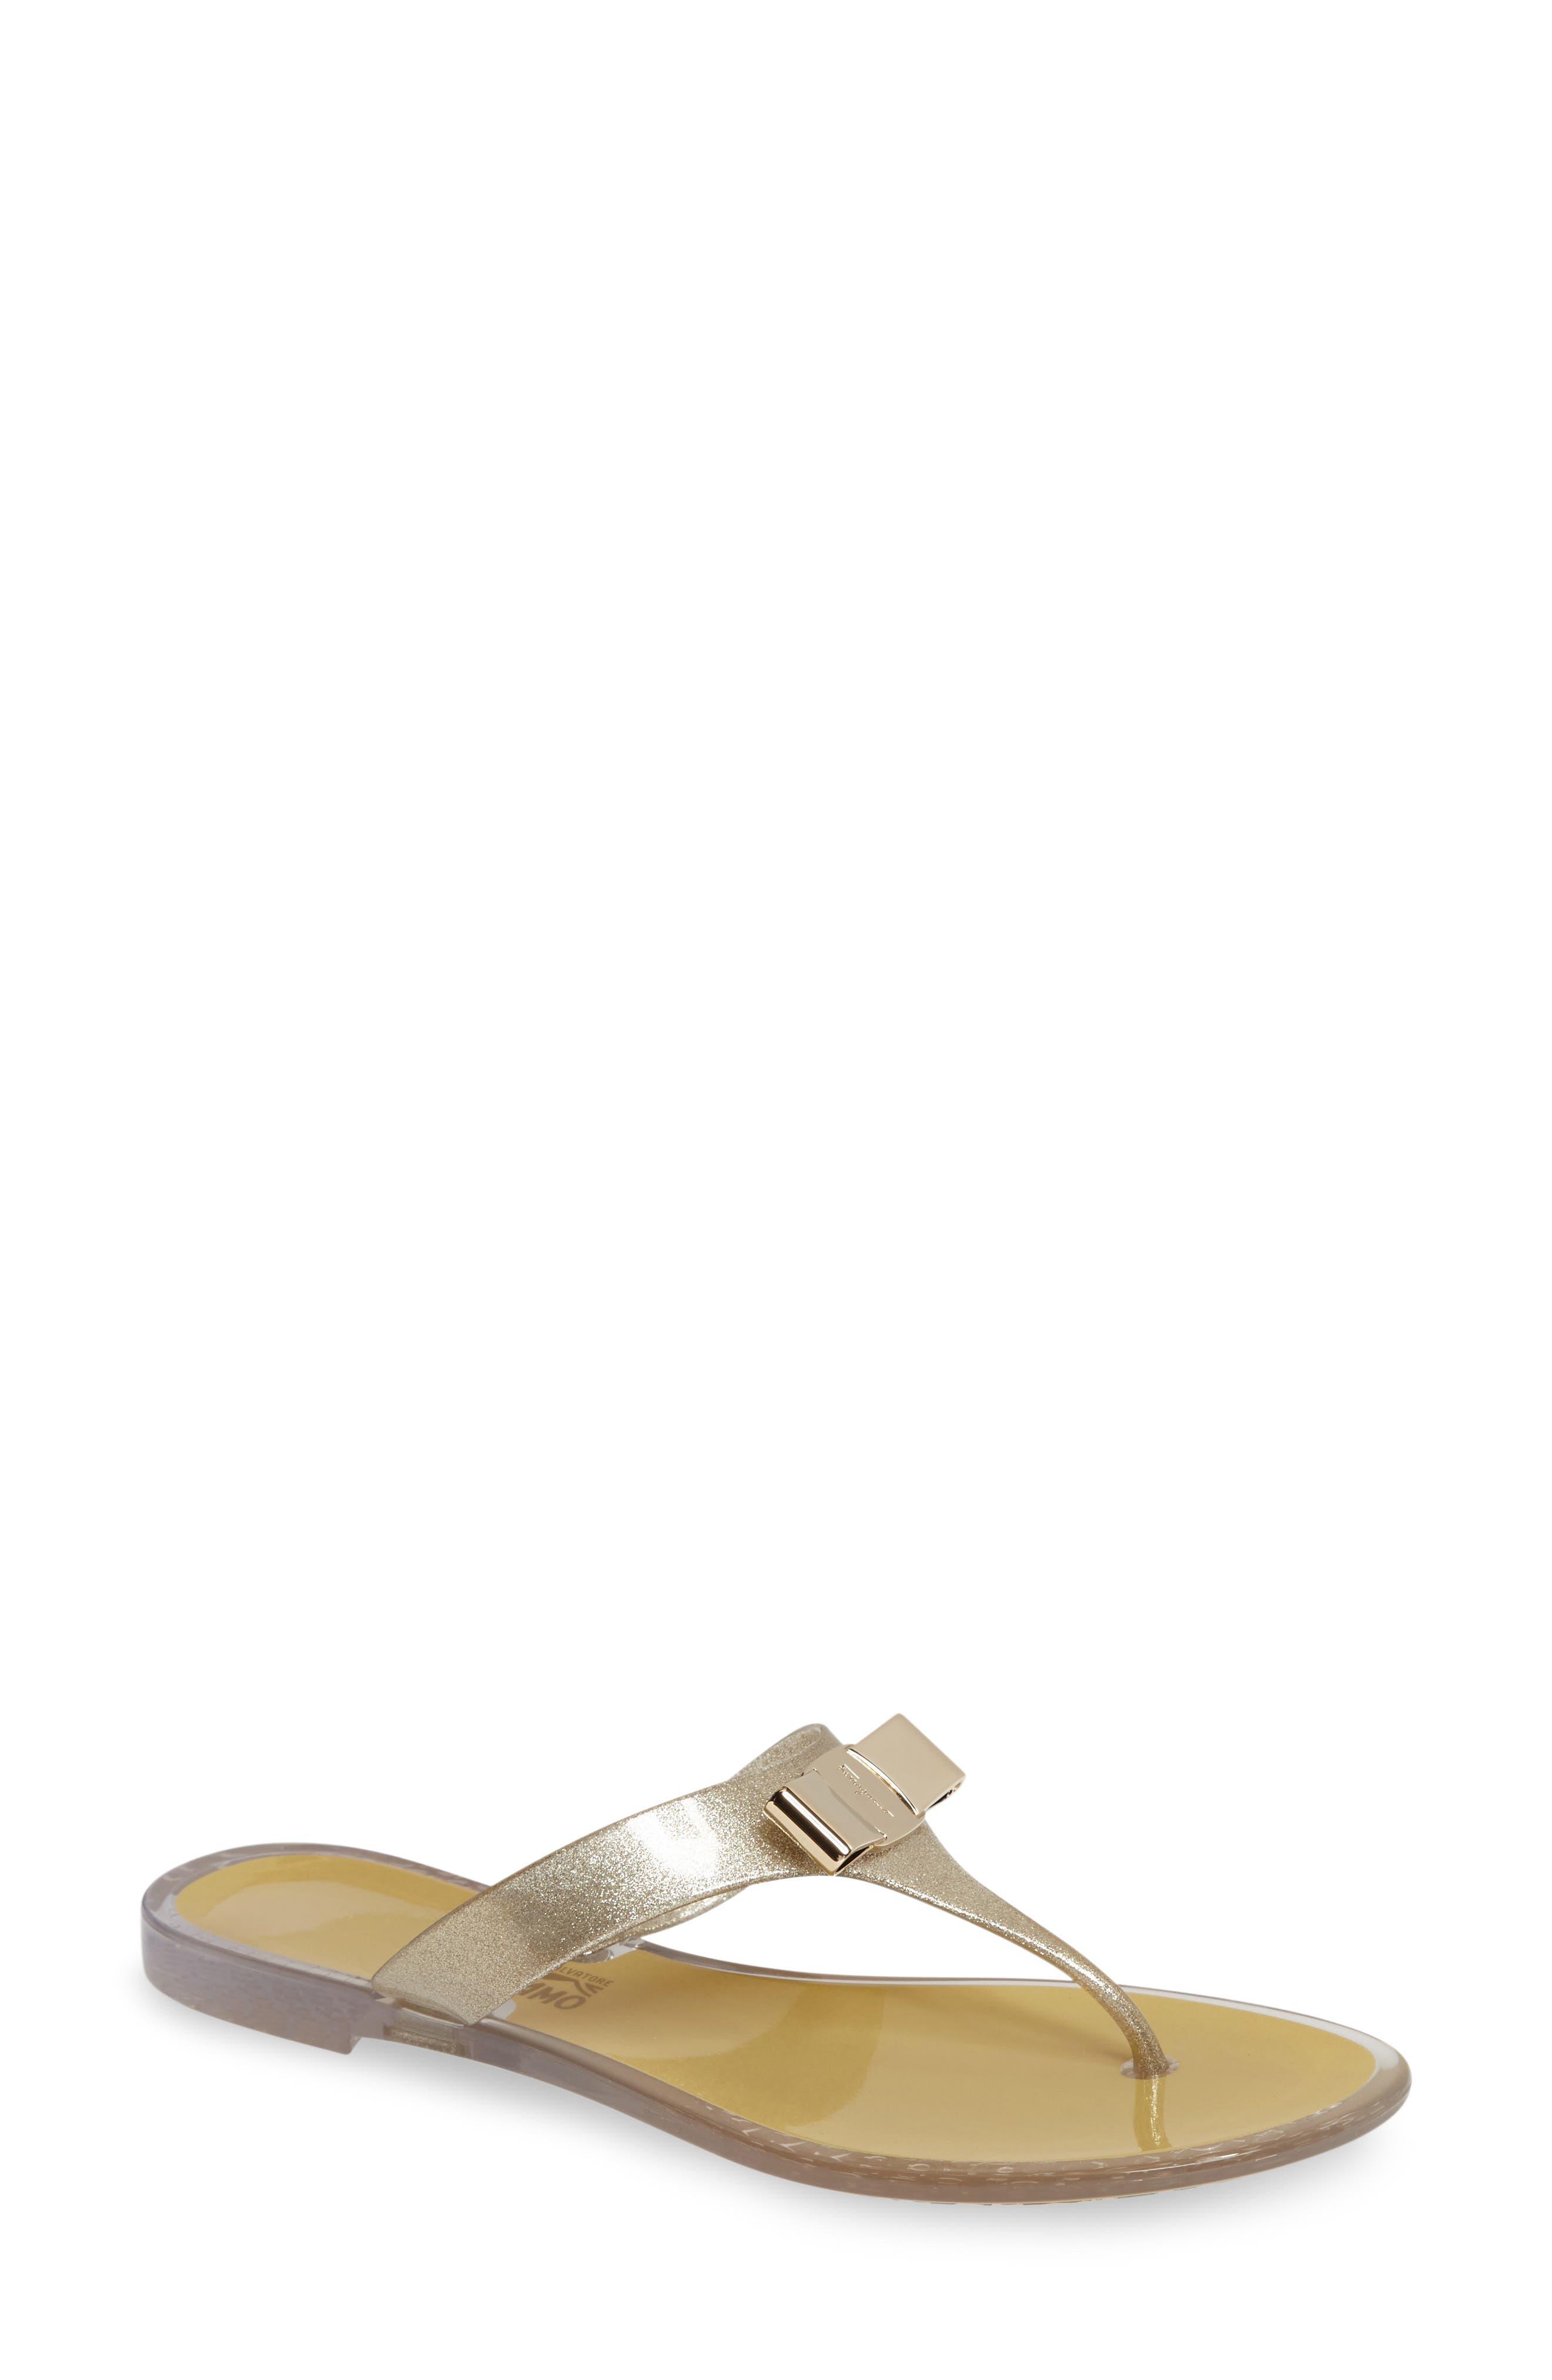 Main Image - Salvatore Ferragamo Jelly Flat Bow Sandal (Women)